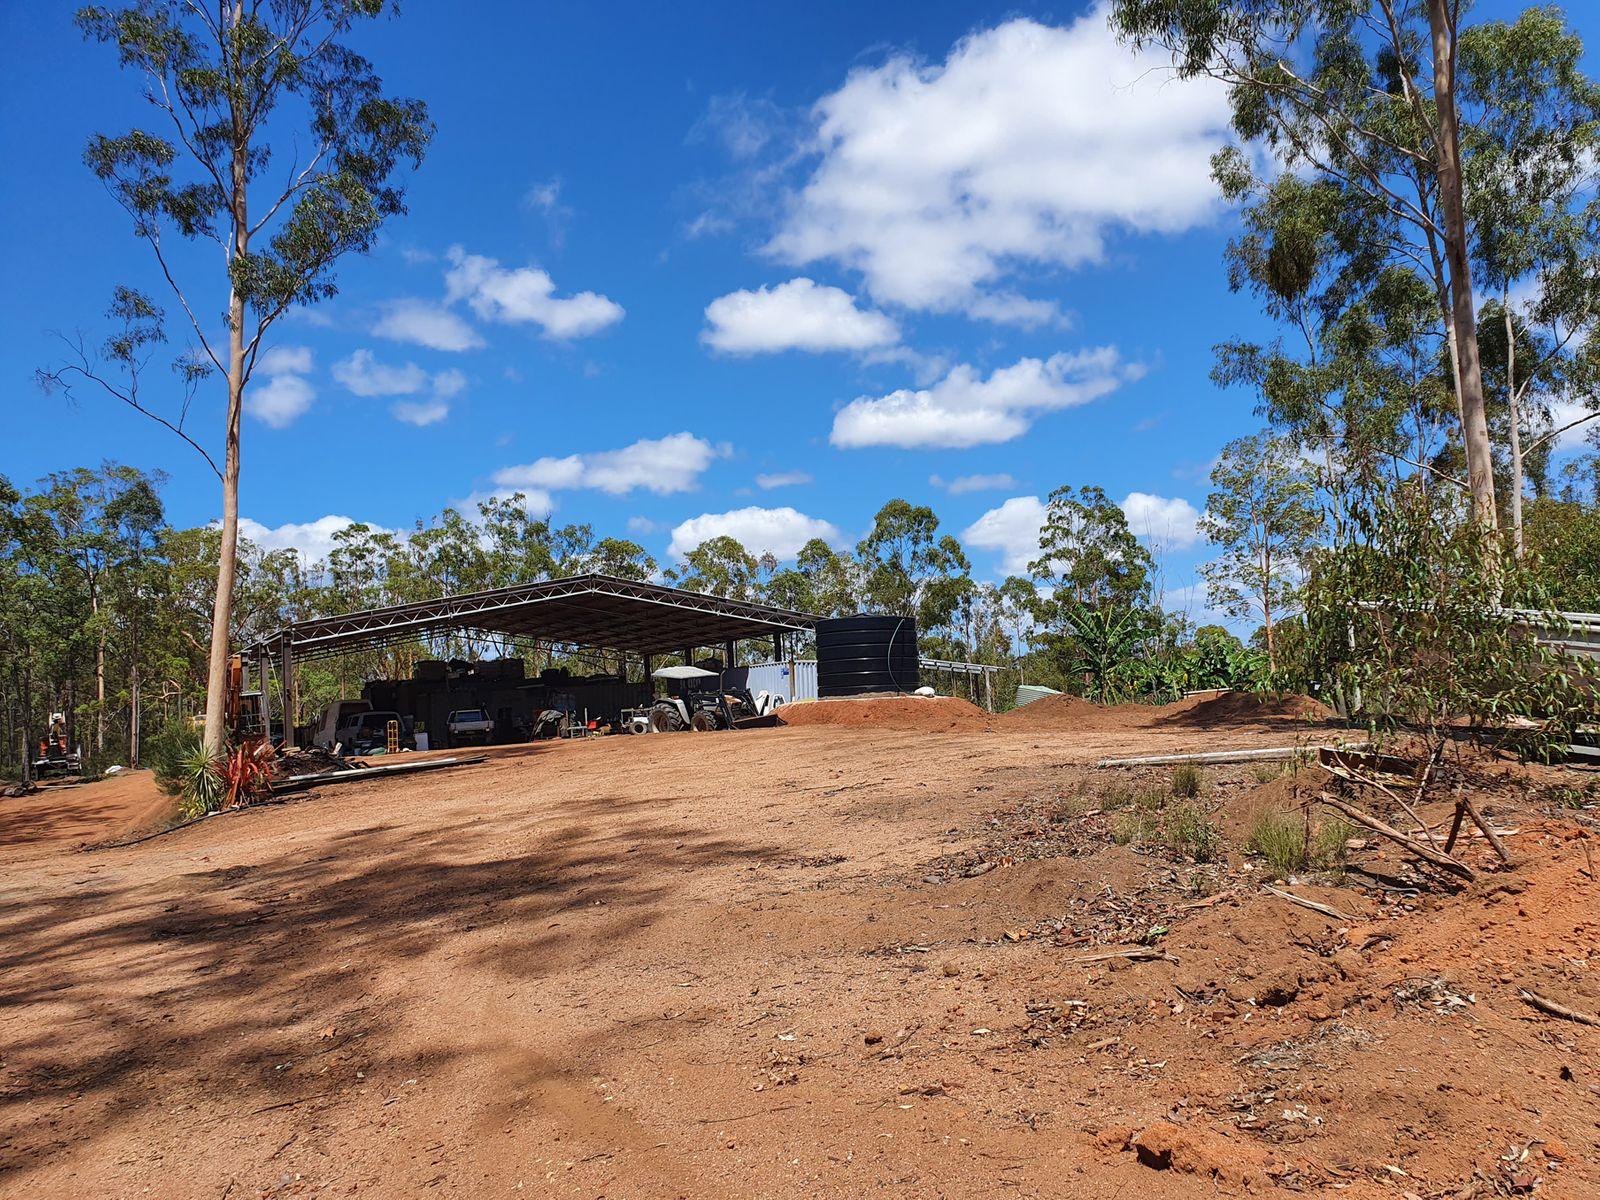 Lot 17/0 Svenssons Road, Promisedland, QLD 4660